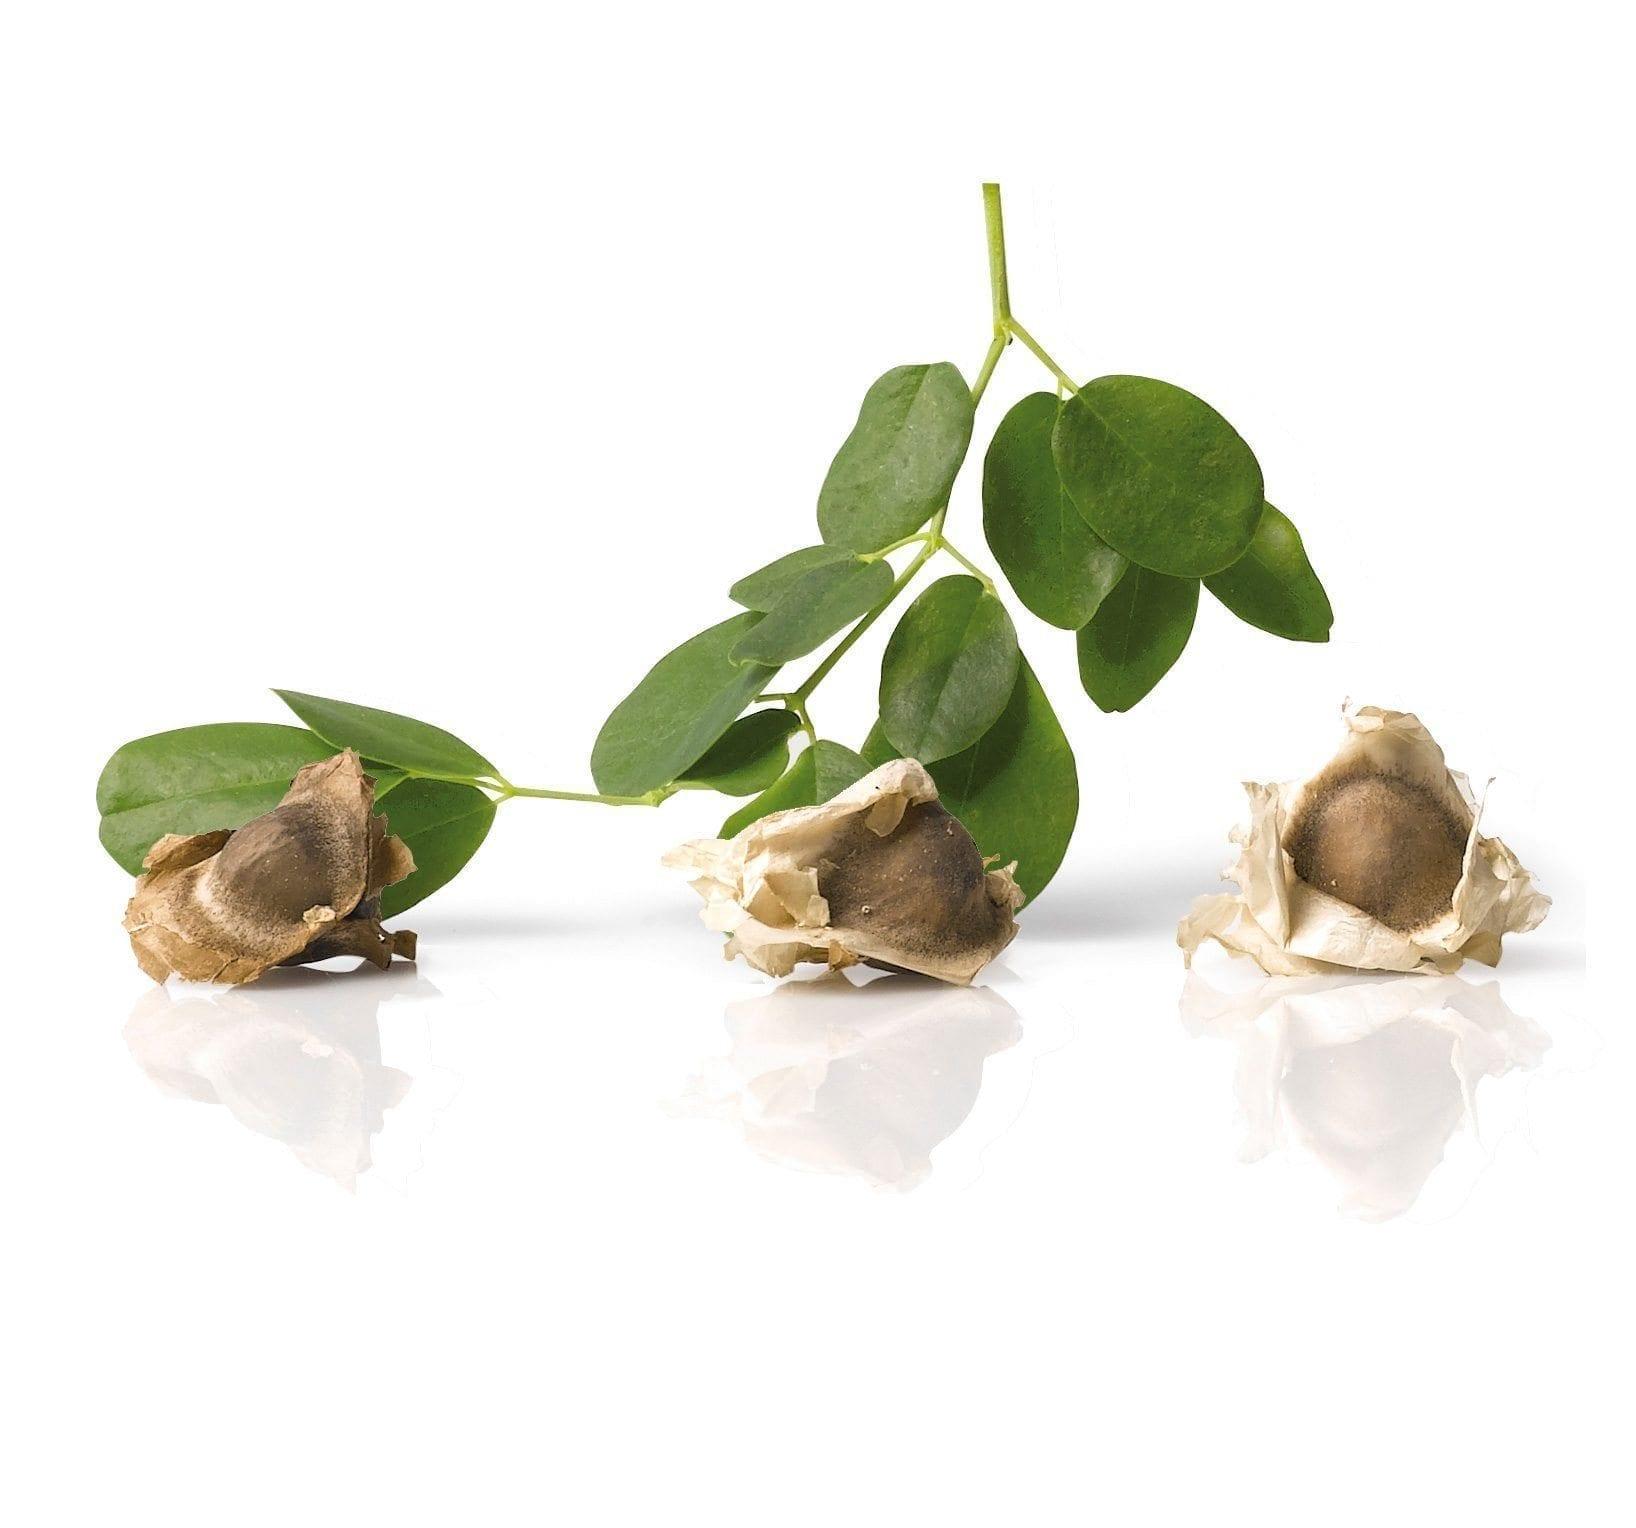 Moringa olifeira zaad olie